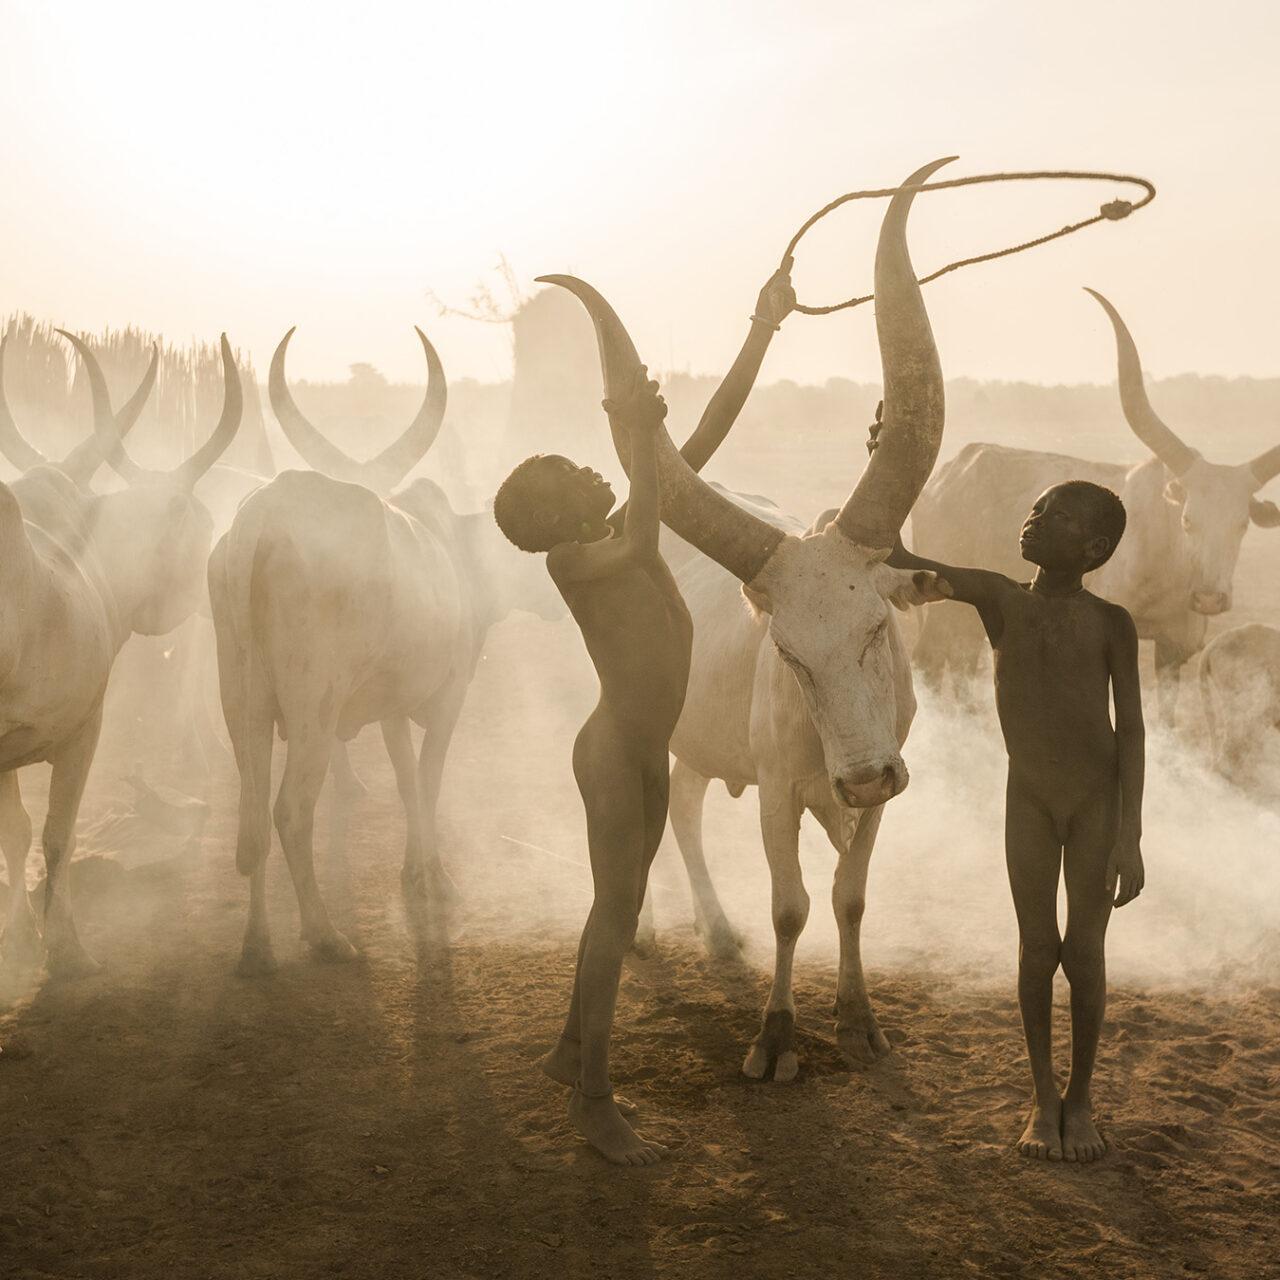 03 - © Markus Mauthe - Kinder Der Mundari Kümmern Sich Um Die Rinder Im Sudan